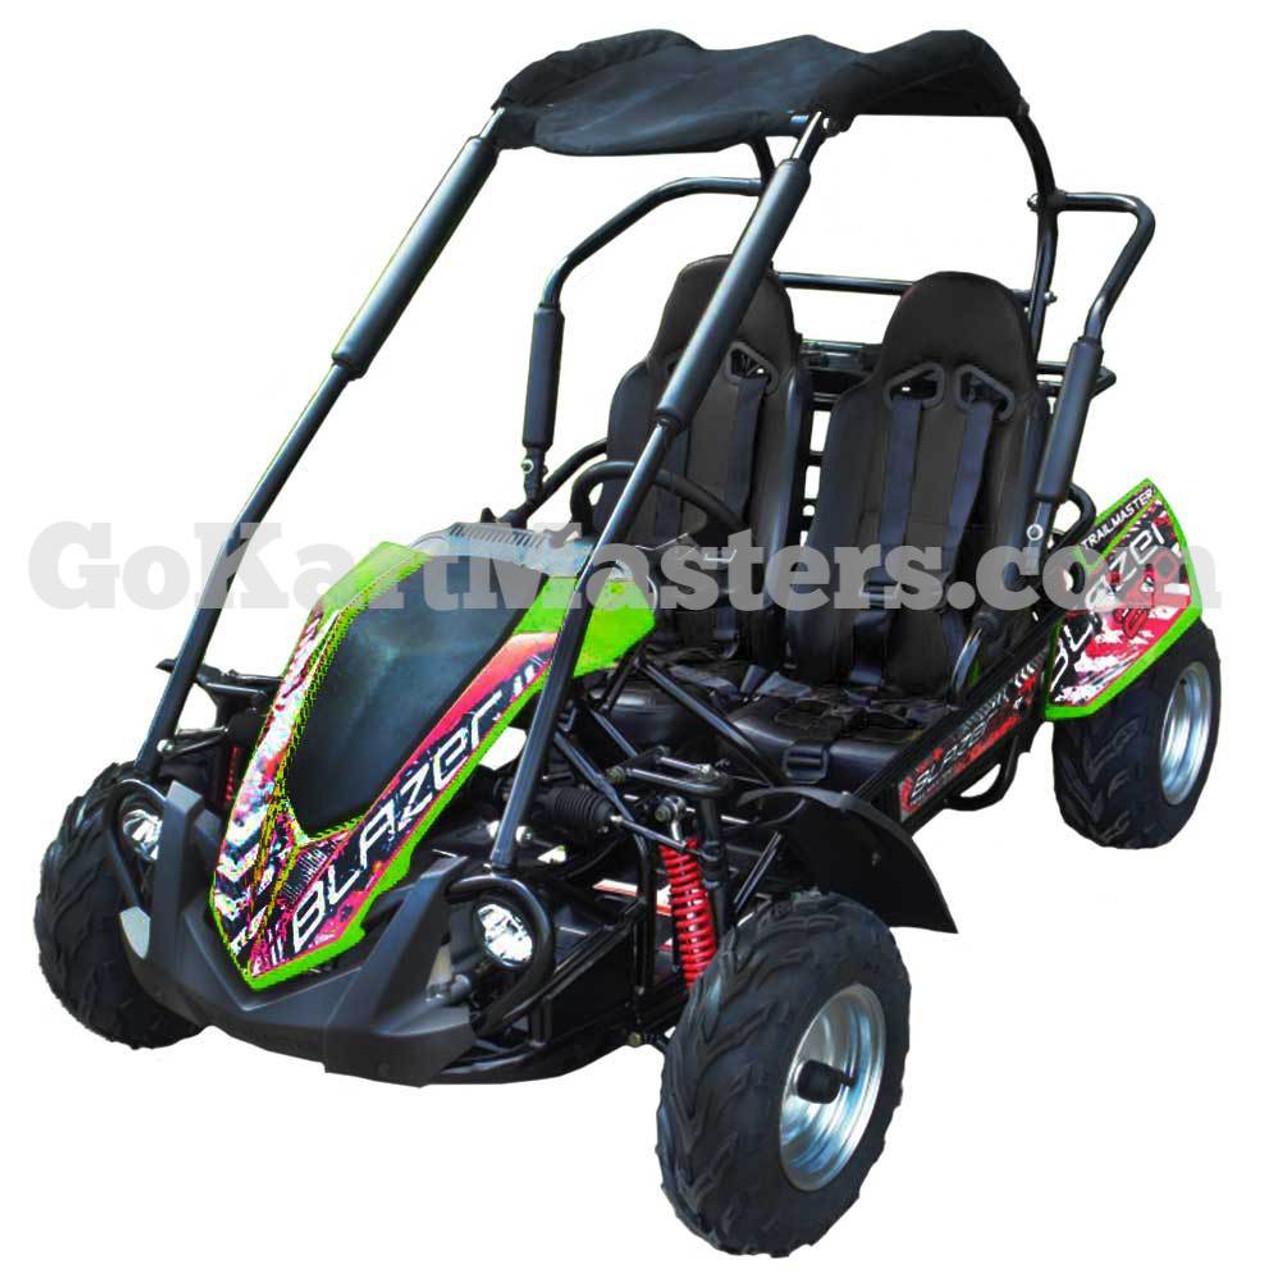 TrailMaster Blazer 200R Go Kart w/ Reverse - Green